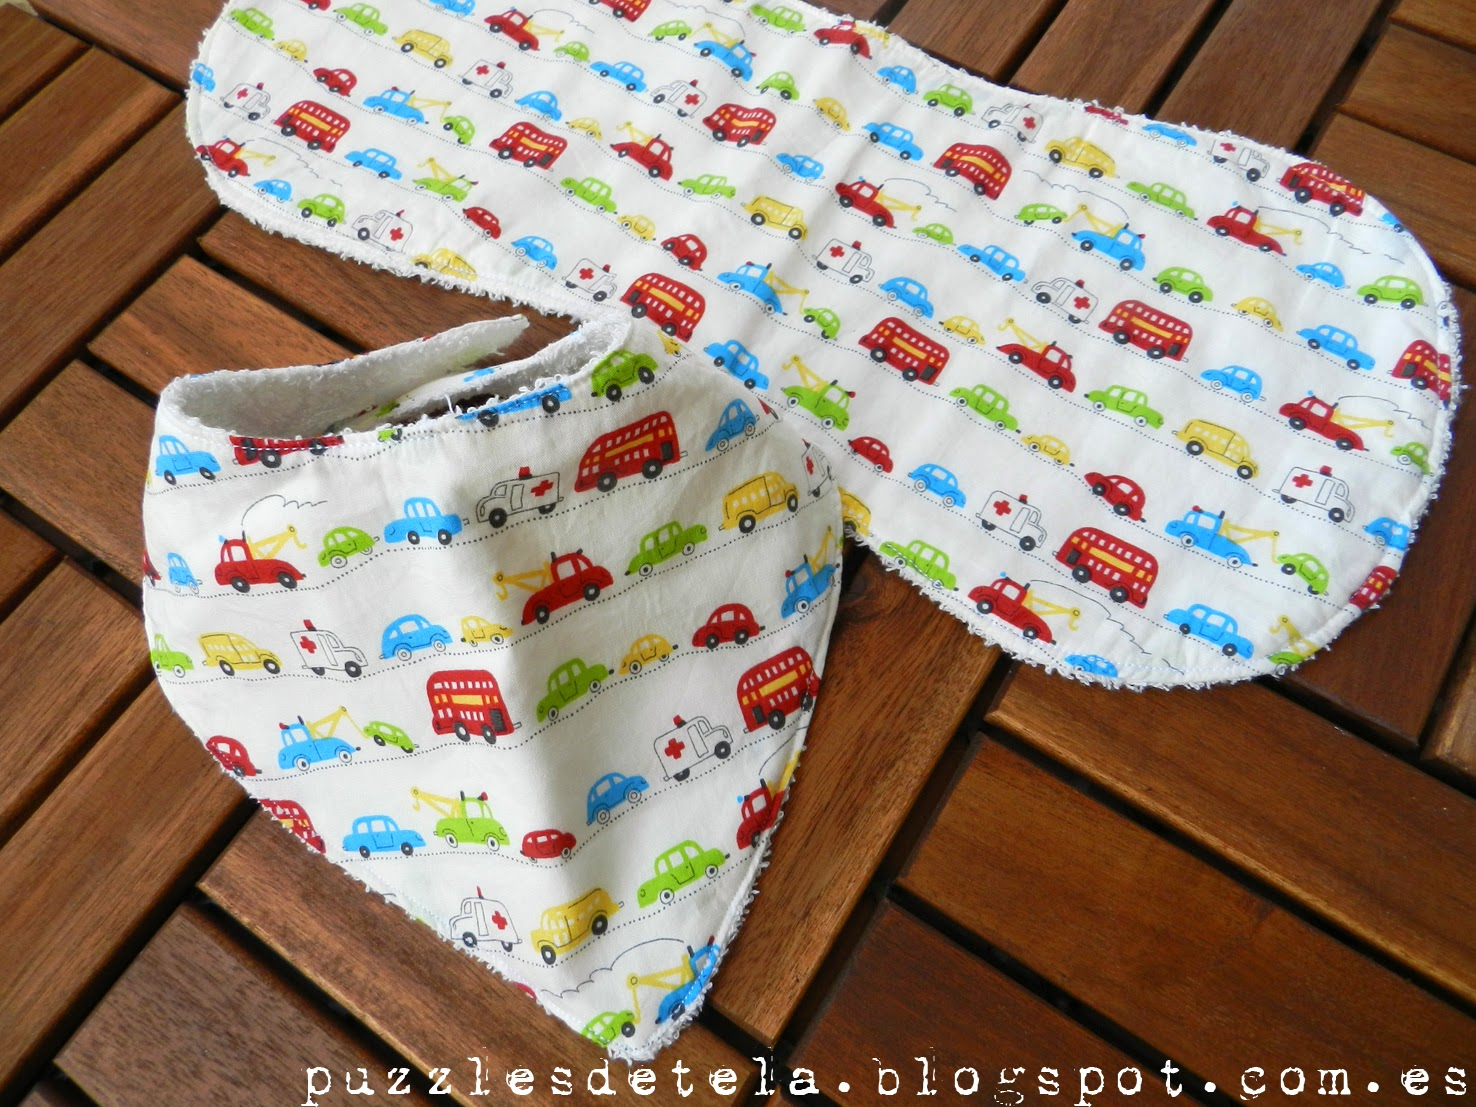 Puzzles de tela, regalos para bebés, babero bandolera, toalla de lactancia, patchwork,  hecho a mano, handmade